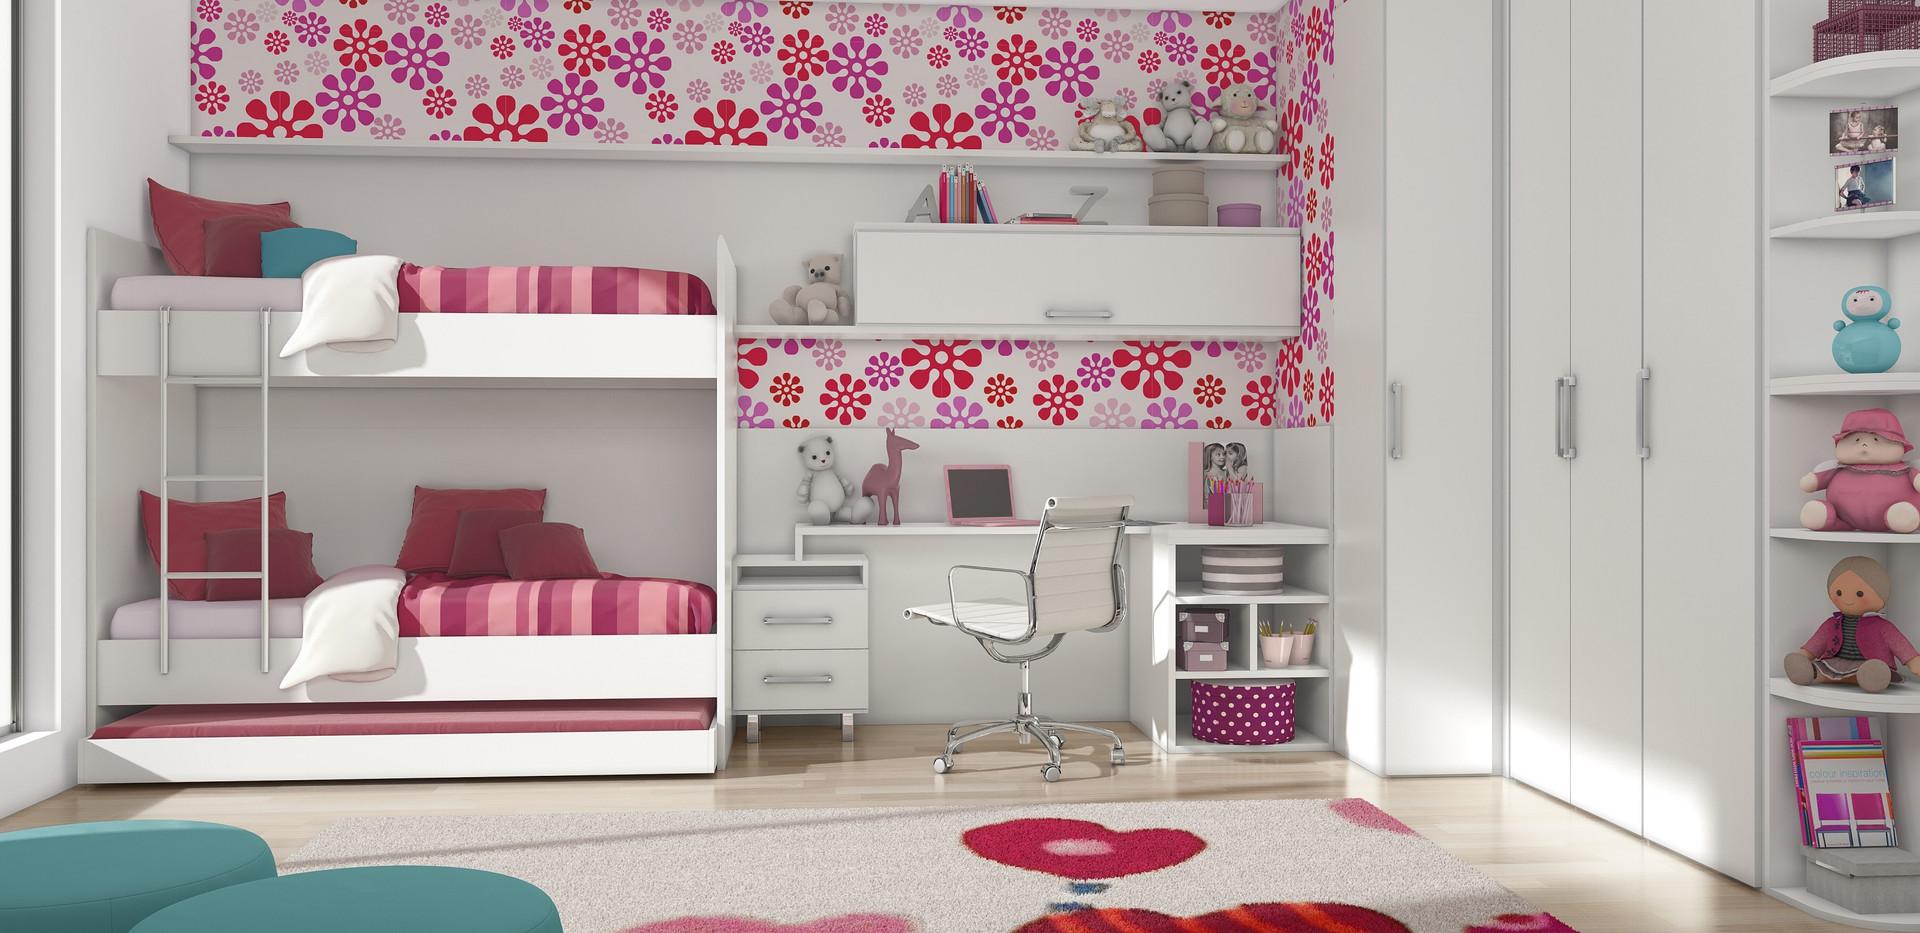 DOR09_dormitorio_quarto_guarda_roupa_men